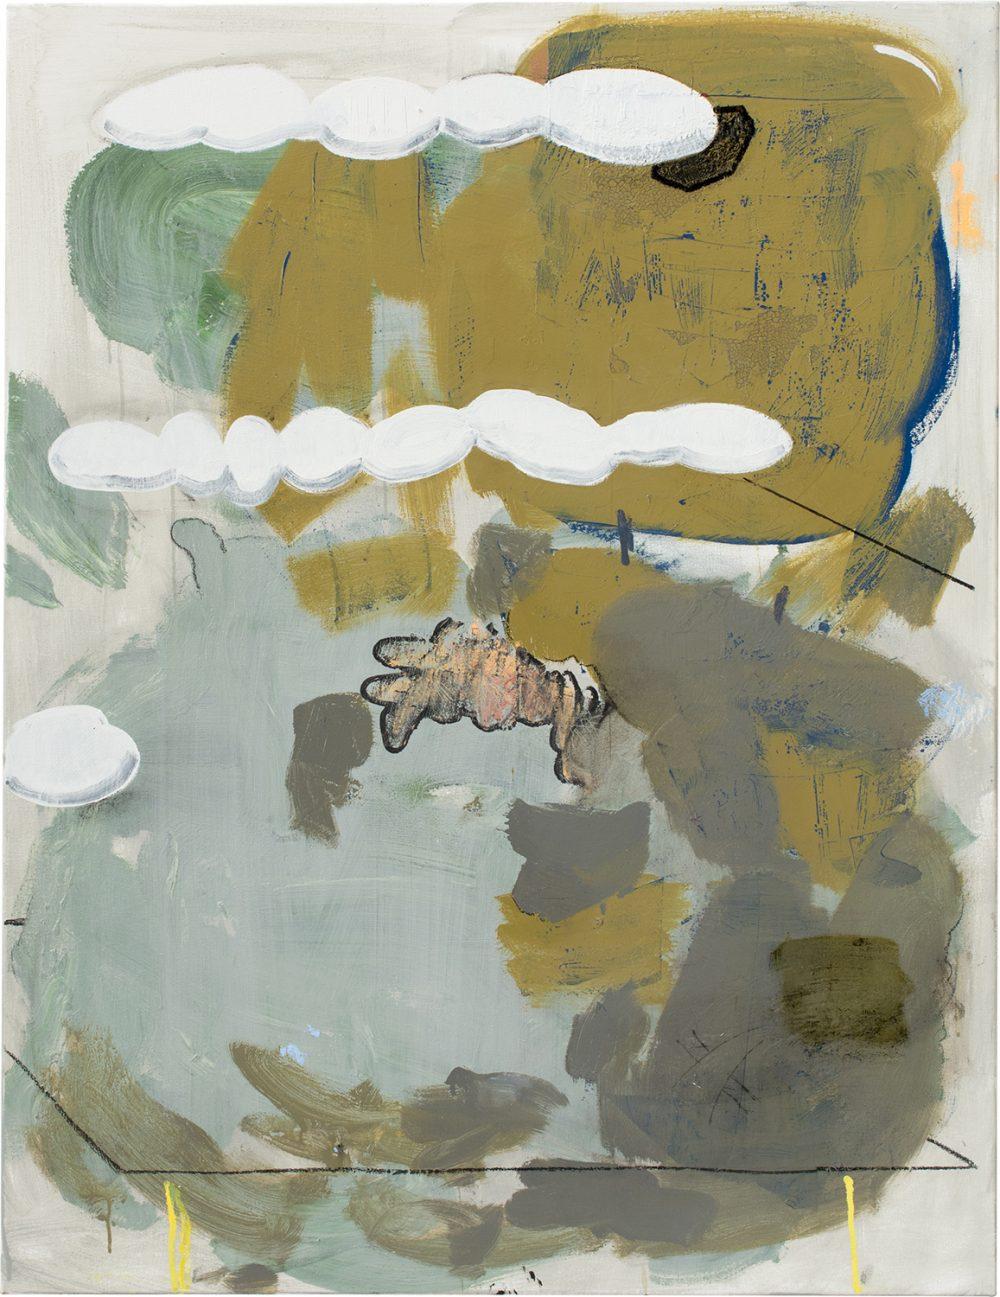 o.T. 57 (2017), Öl, Lack, Kohle auf Leinwand, 130 x 100 cm